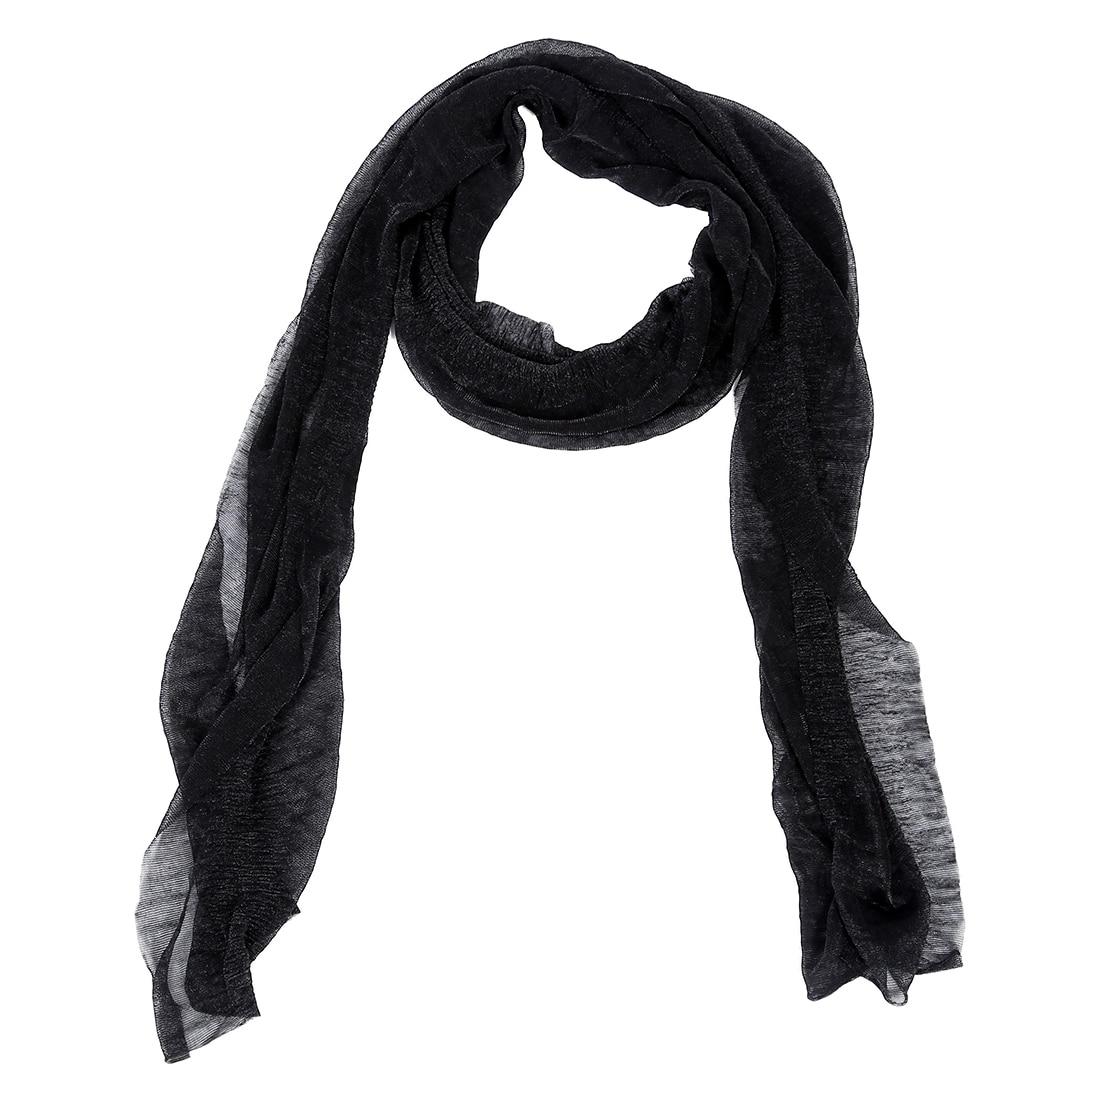 MYTL-Women's Fashion Candy Colour Soft   Scarf     Wrap   Shawl Stole